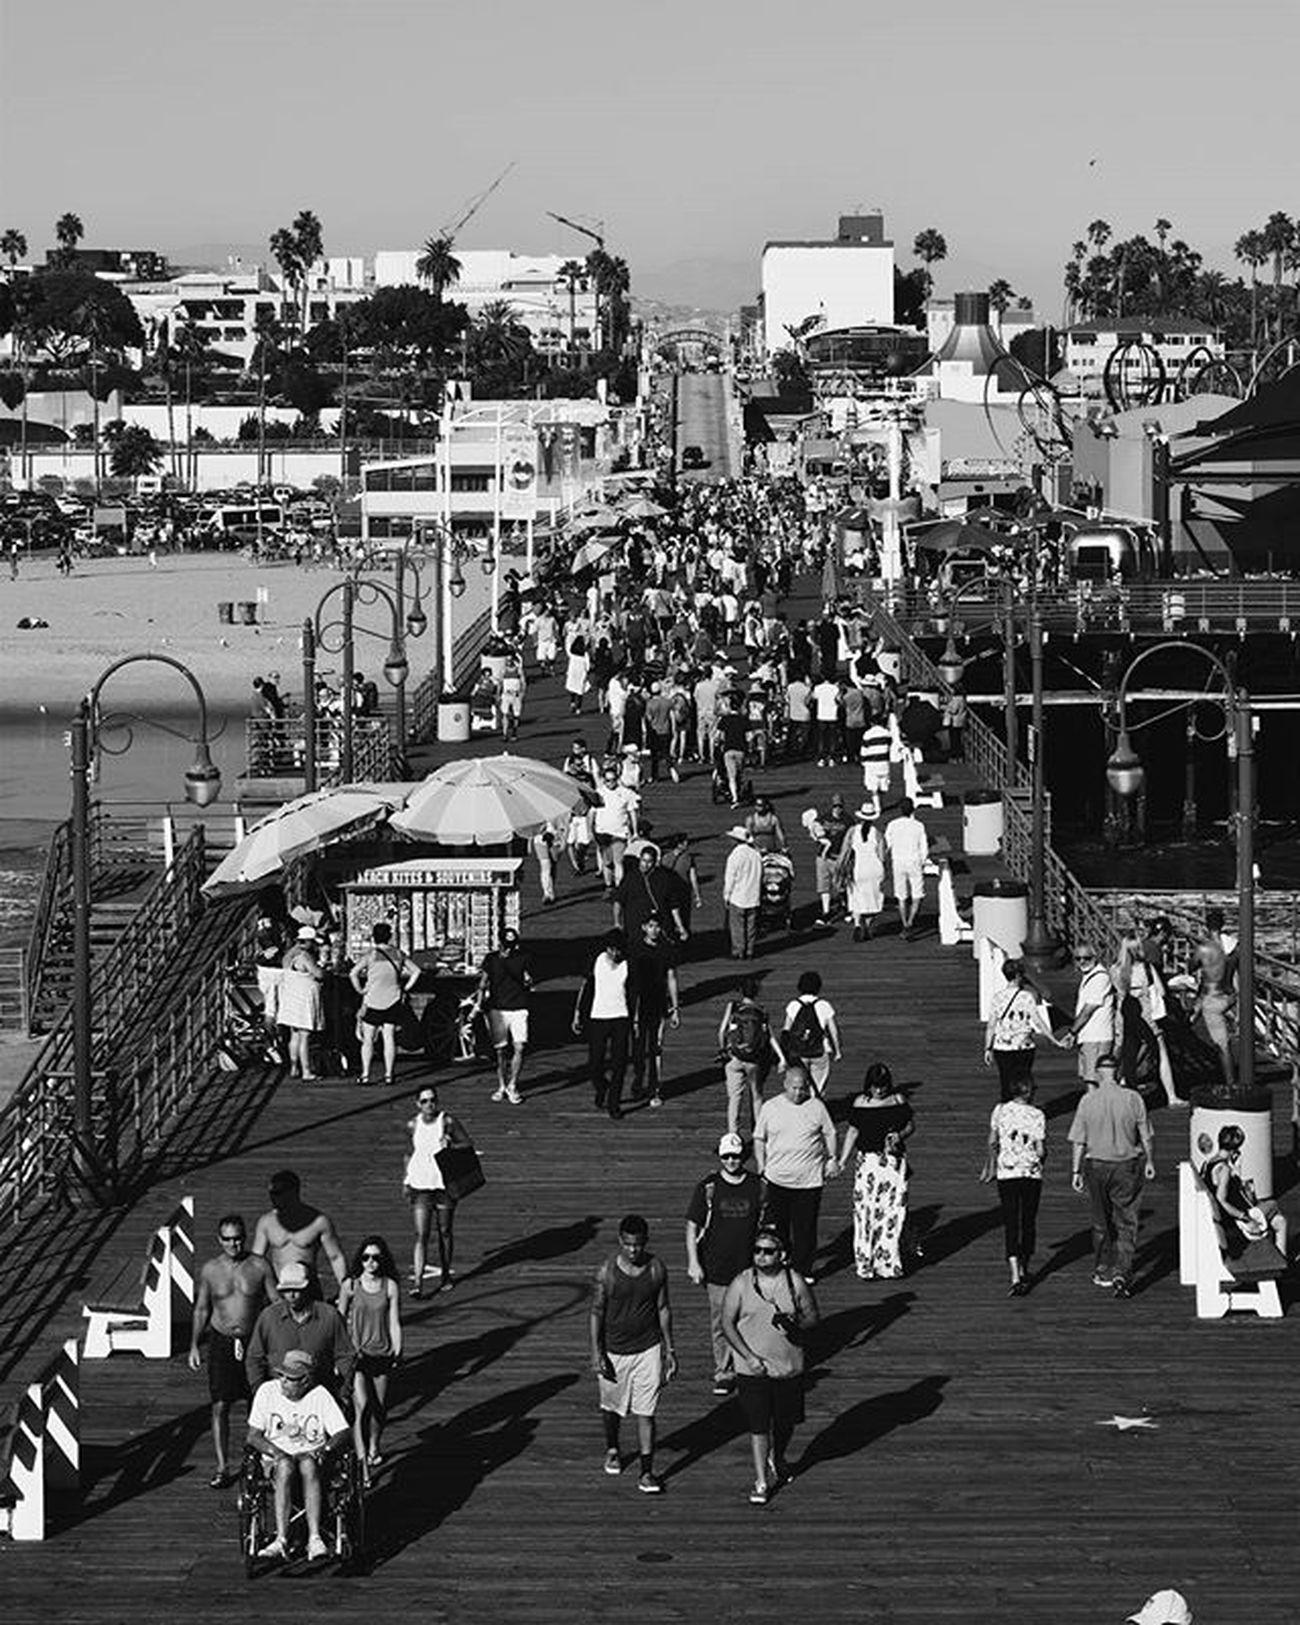 Santamonicapier Santamonica People Ocean WestCoast Nautical Perspective Cali Calidreamin California La Claremont Bnw Blackandwhite Bnw_globe Bnw_rose Bnw_captures Bnw_captures Bnw_planet Bnw_society Bnw_photo Bnw_life Bnw_LA Bnw_nikon Nikon d3300 vsco vscophile vscocam travel